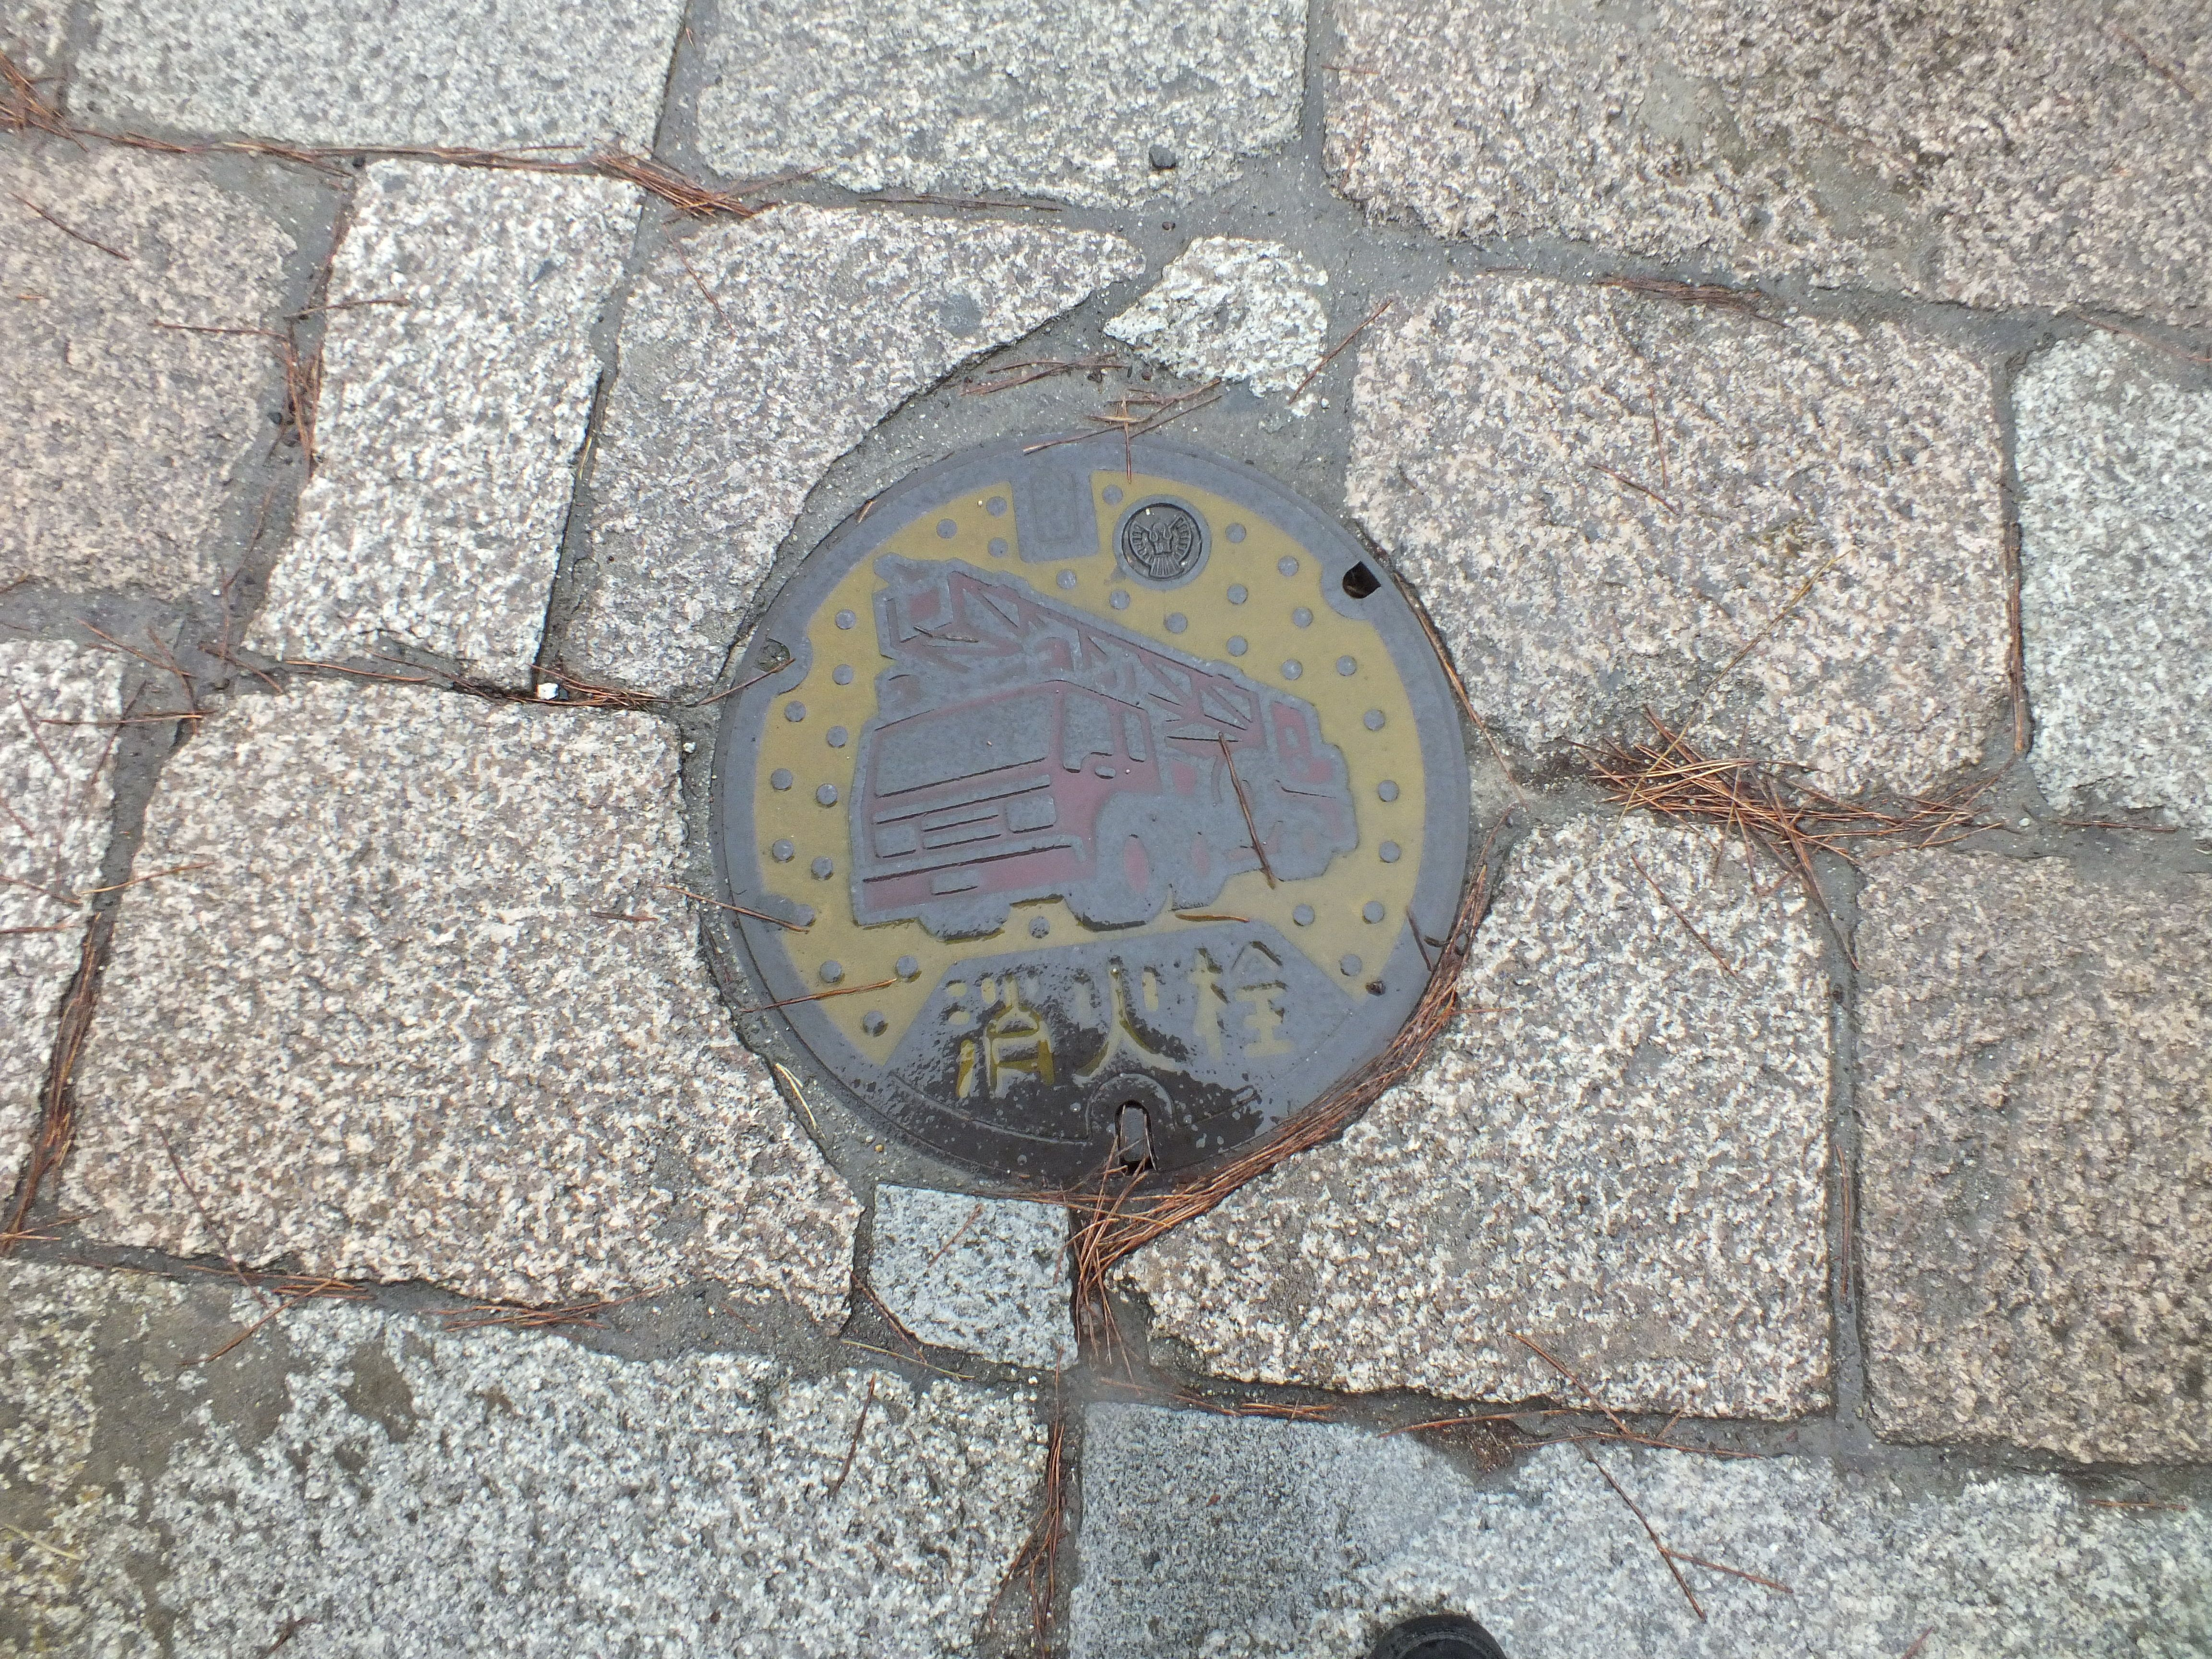 Manhole in Katsuragi city